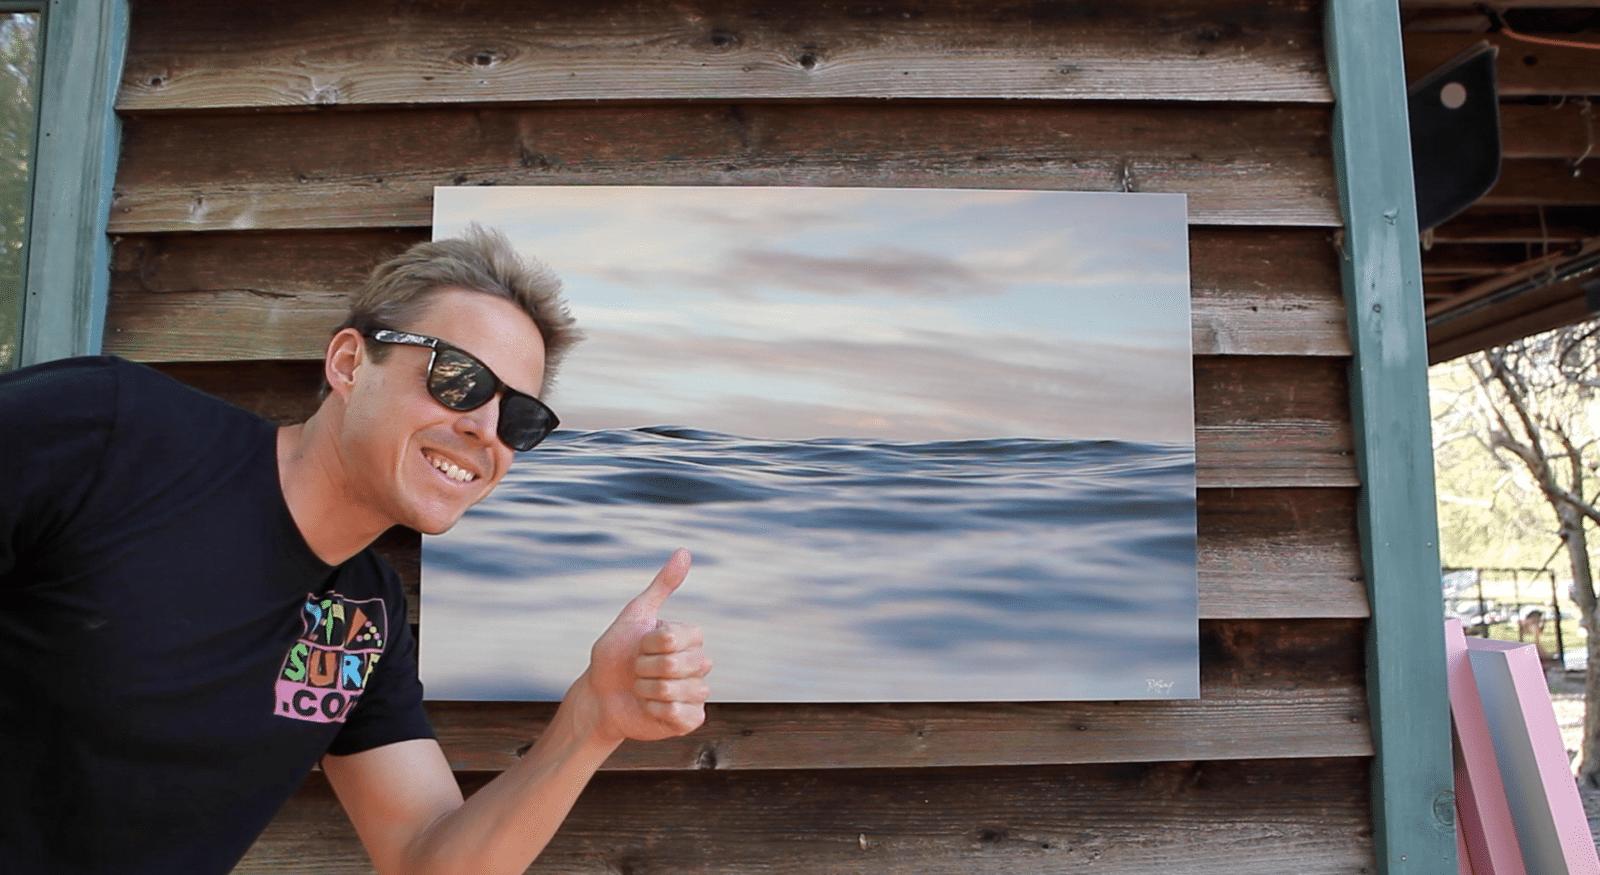 surf art giclee